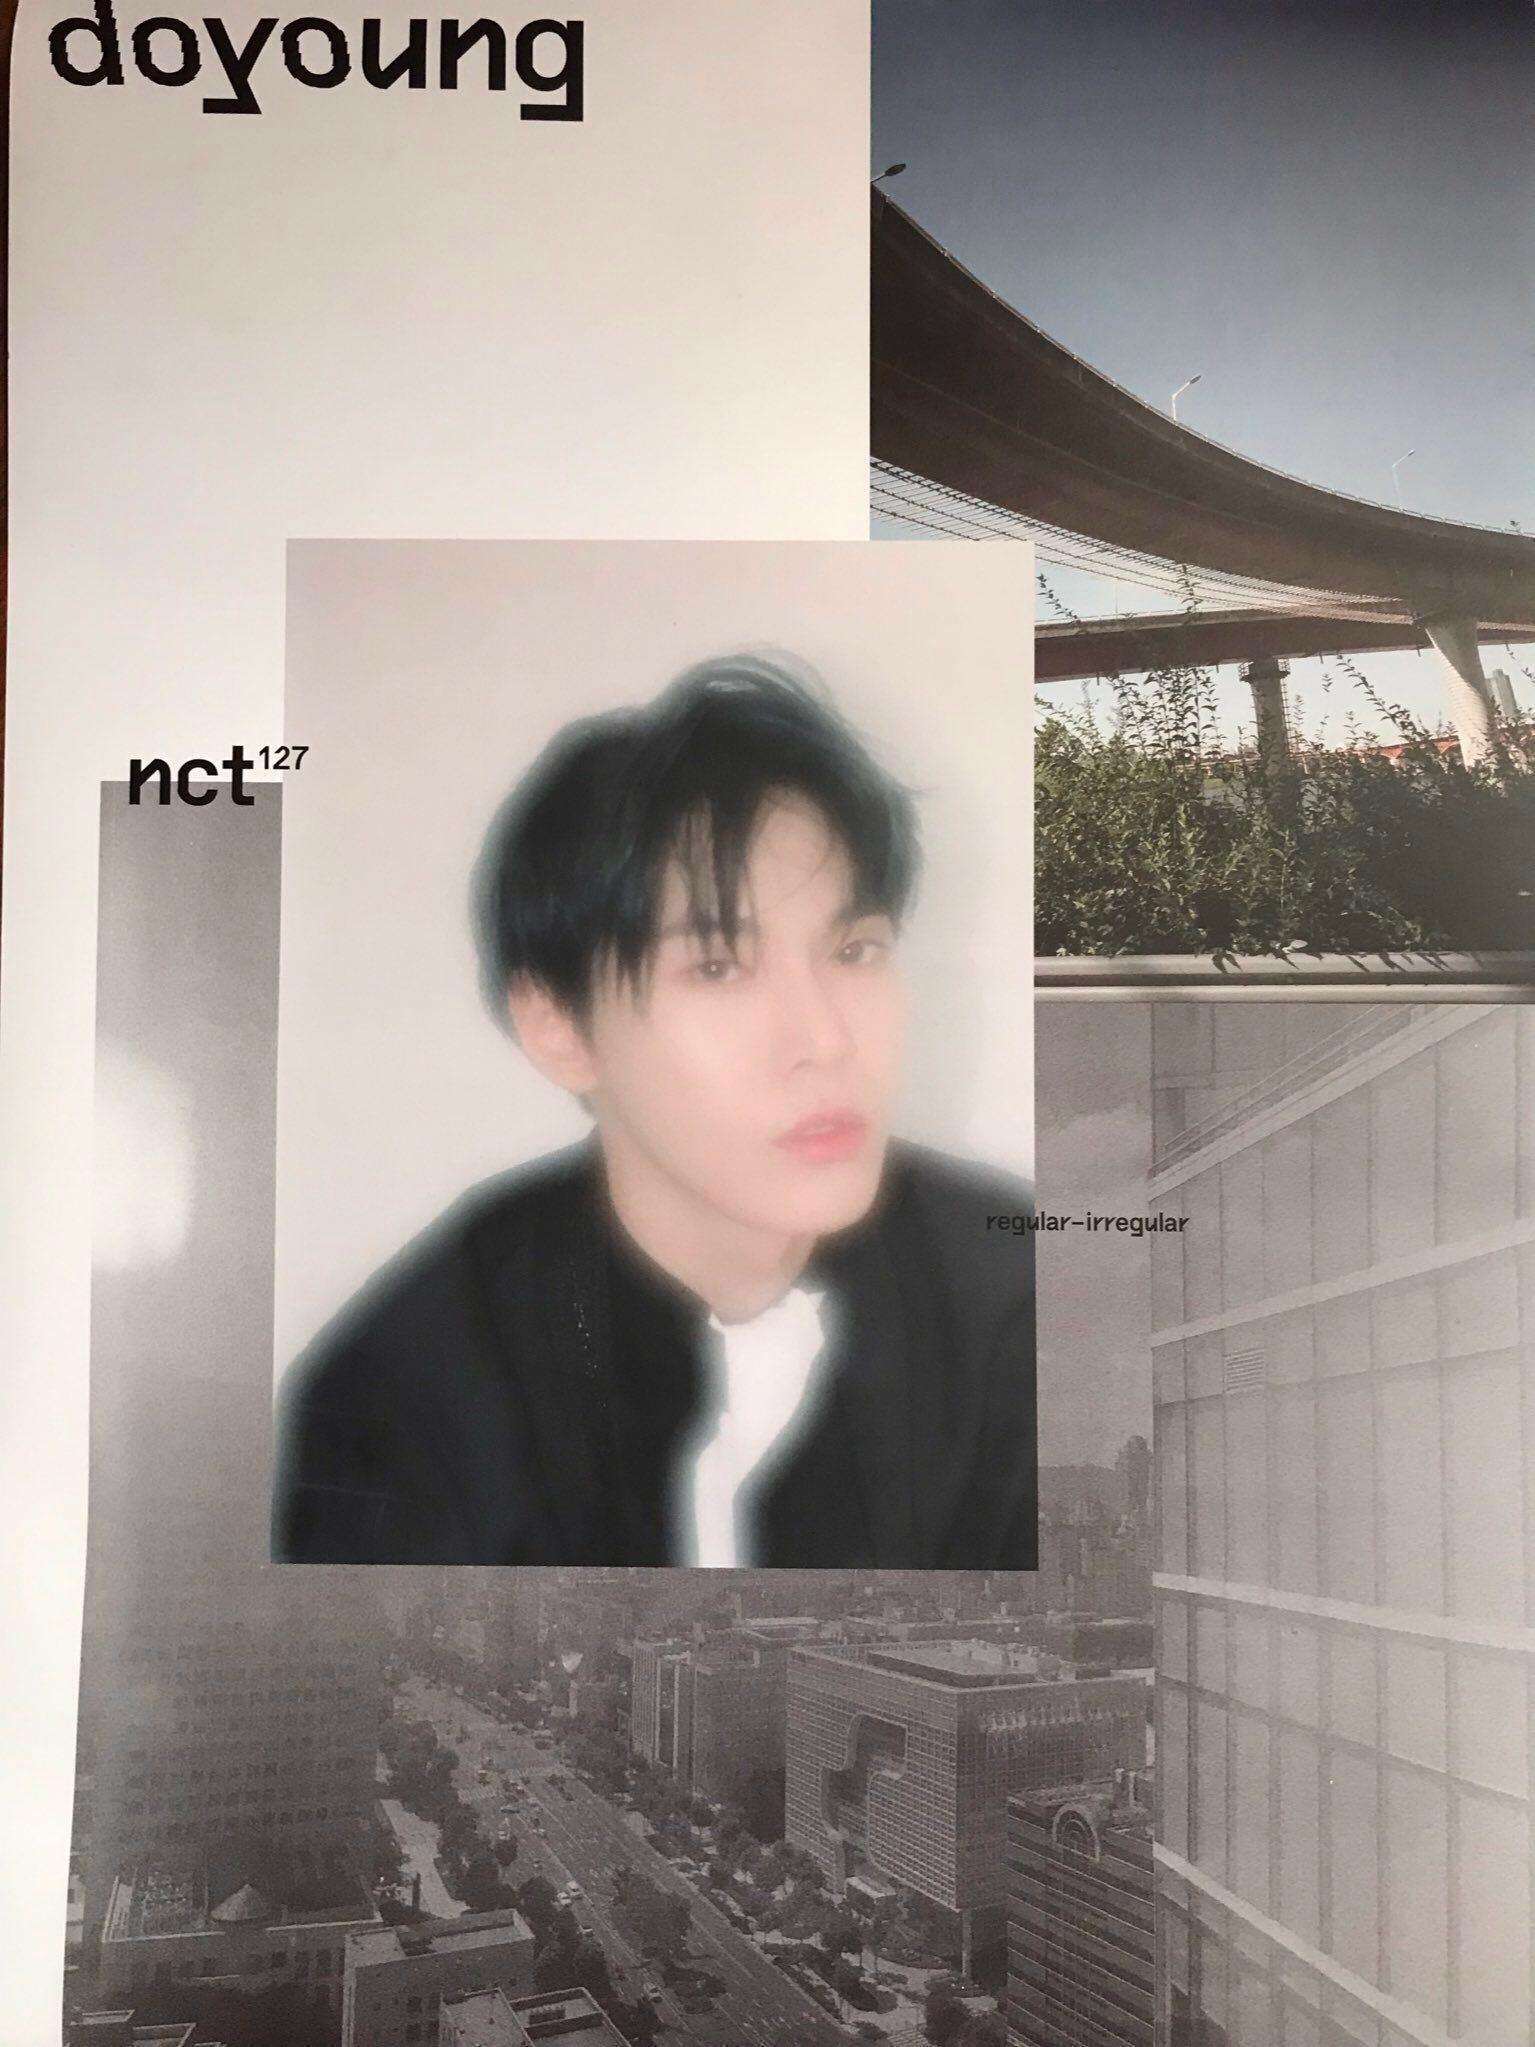 [OFFICIAL] [WTS] NCT 127 Regular-Irregular Poster (DOYOUNG)